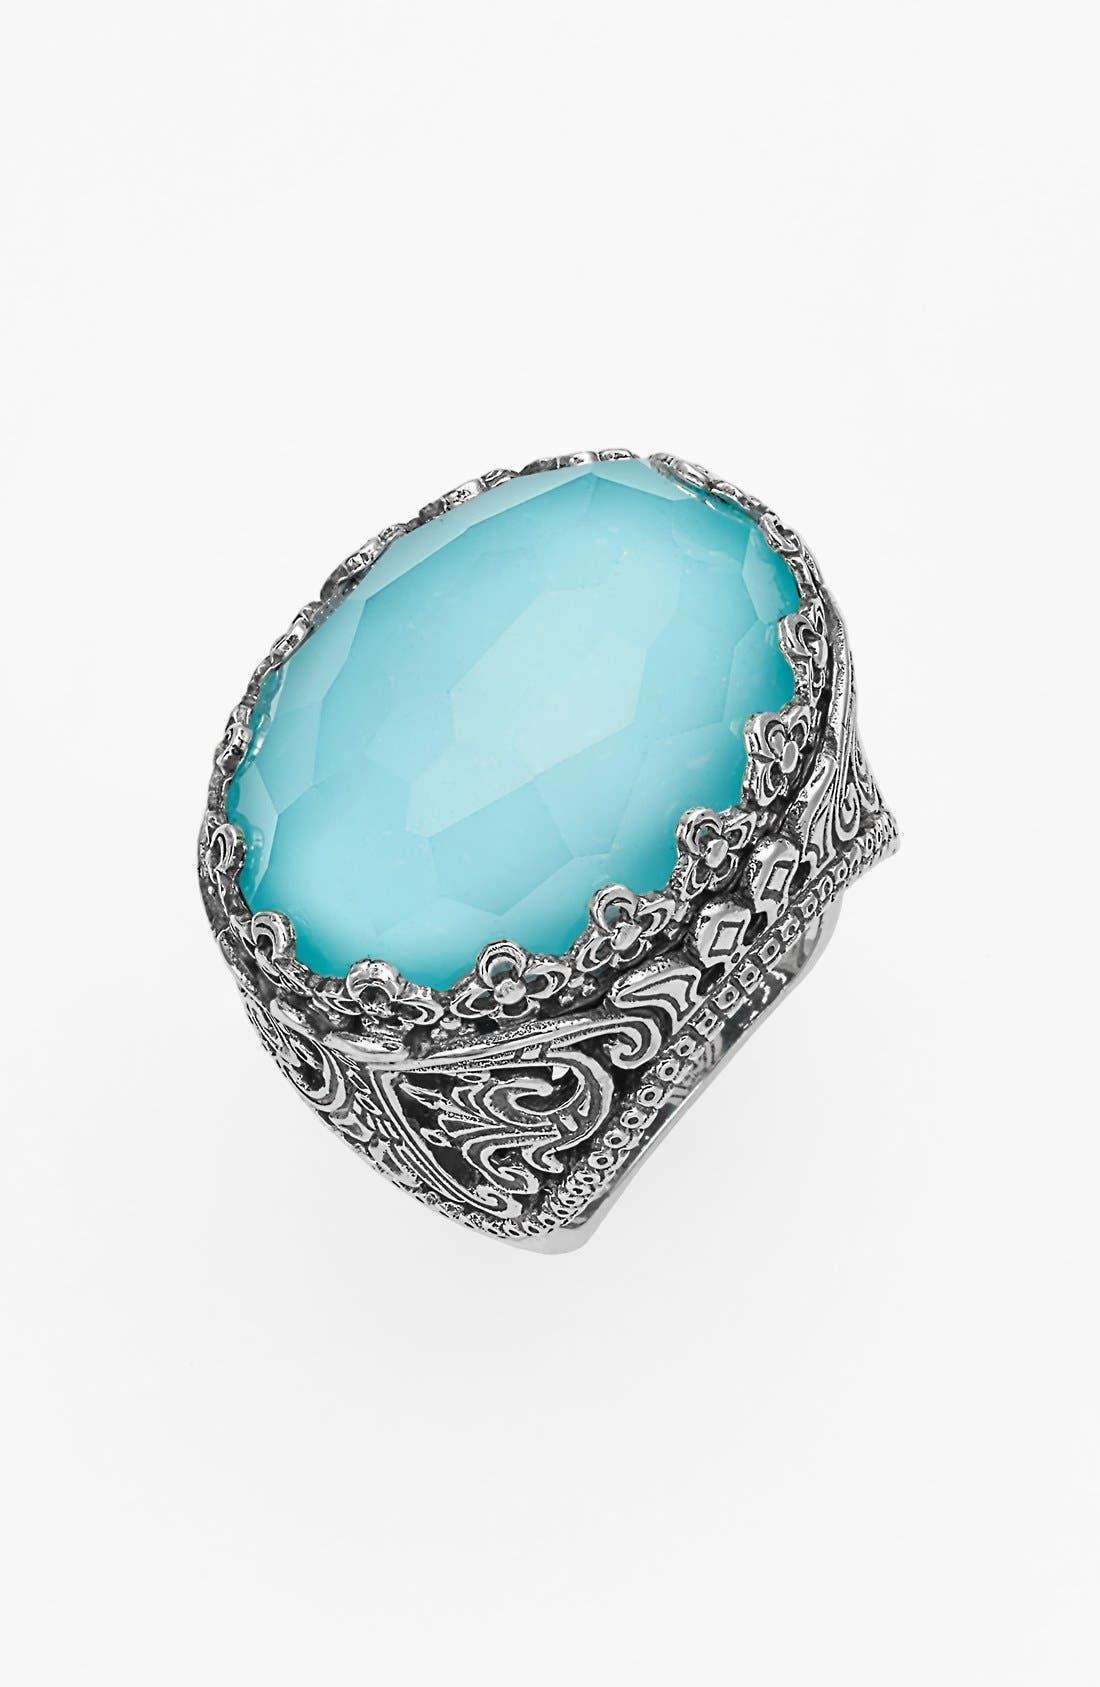 Konstantino 'Aegean' Oval Stone Ring